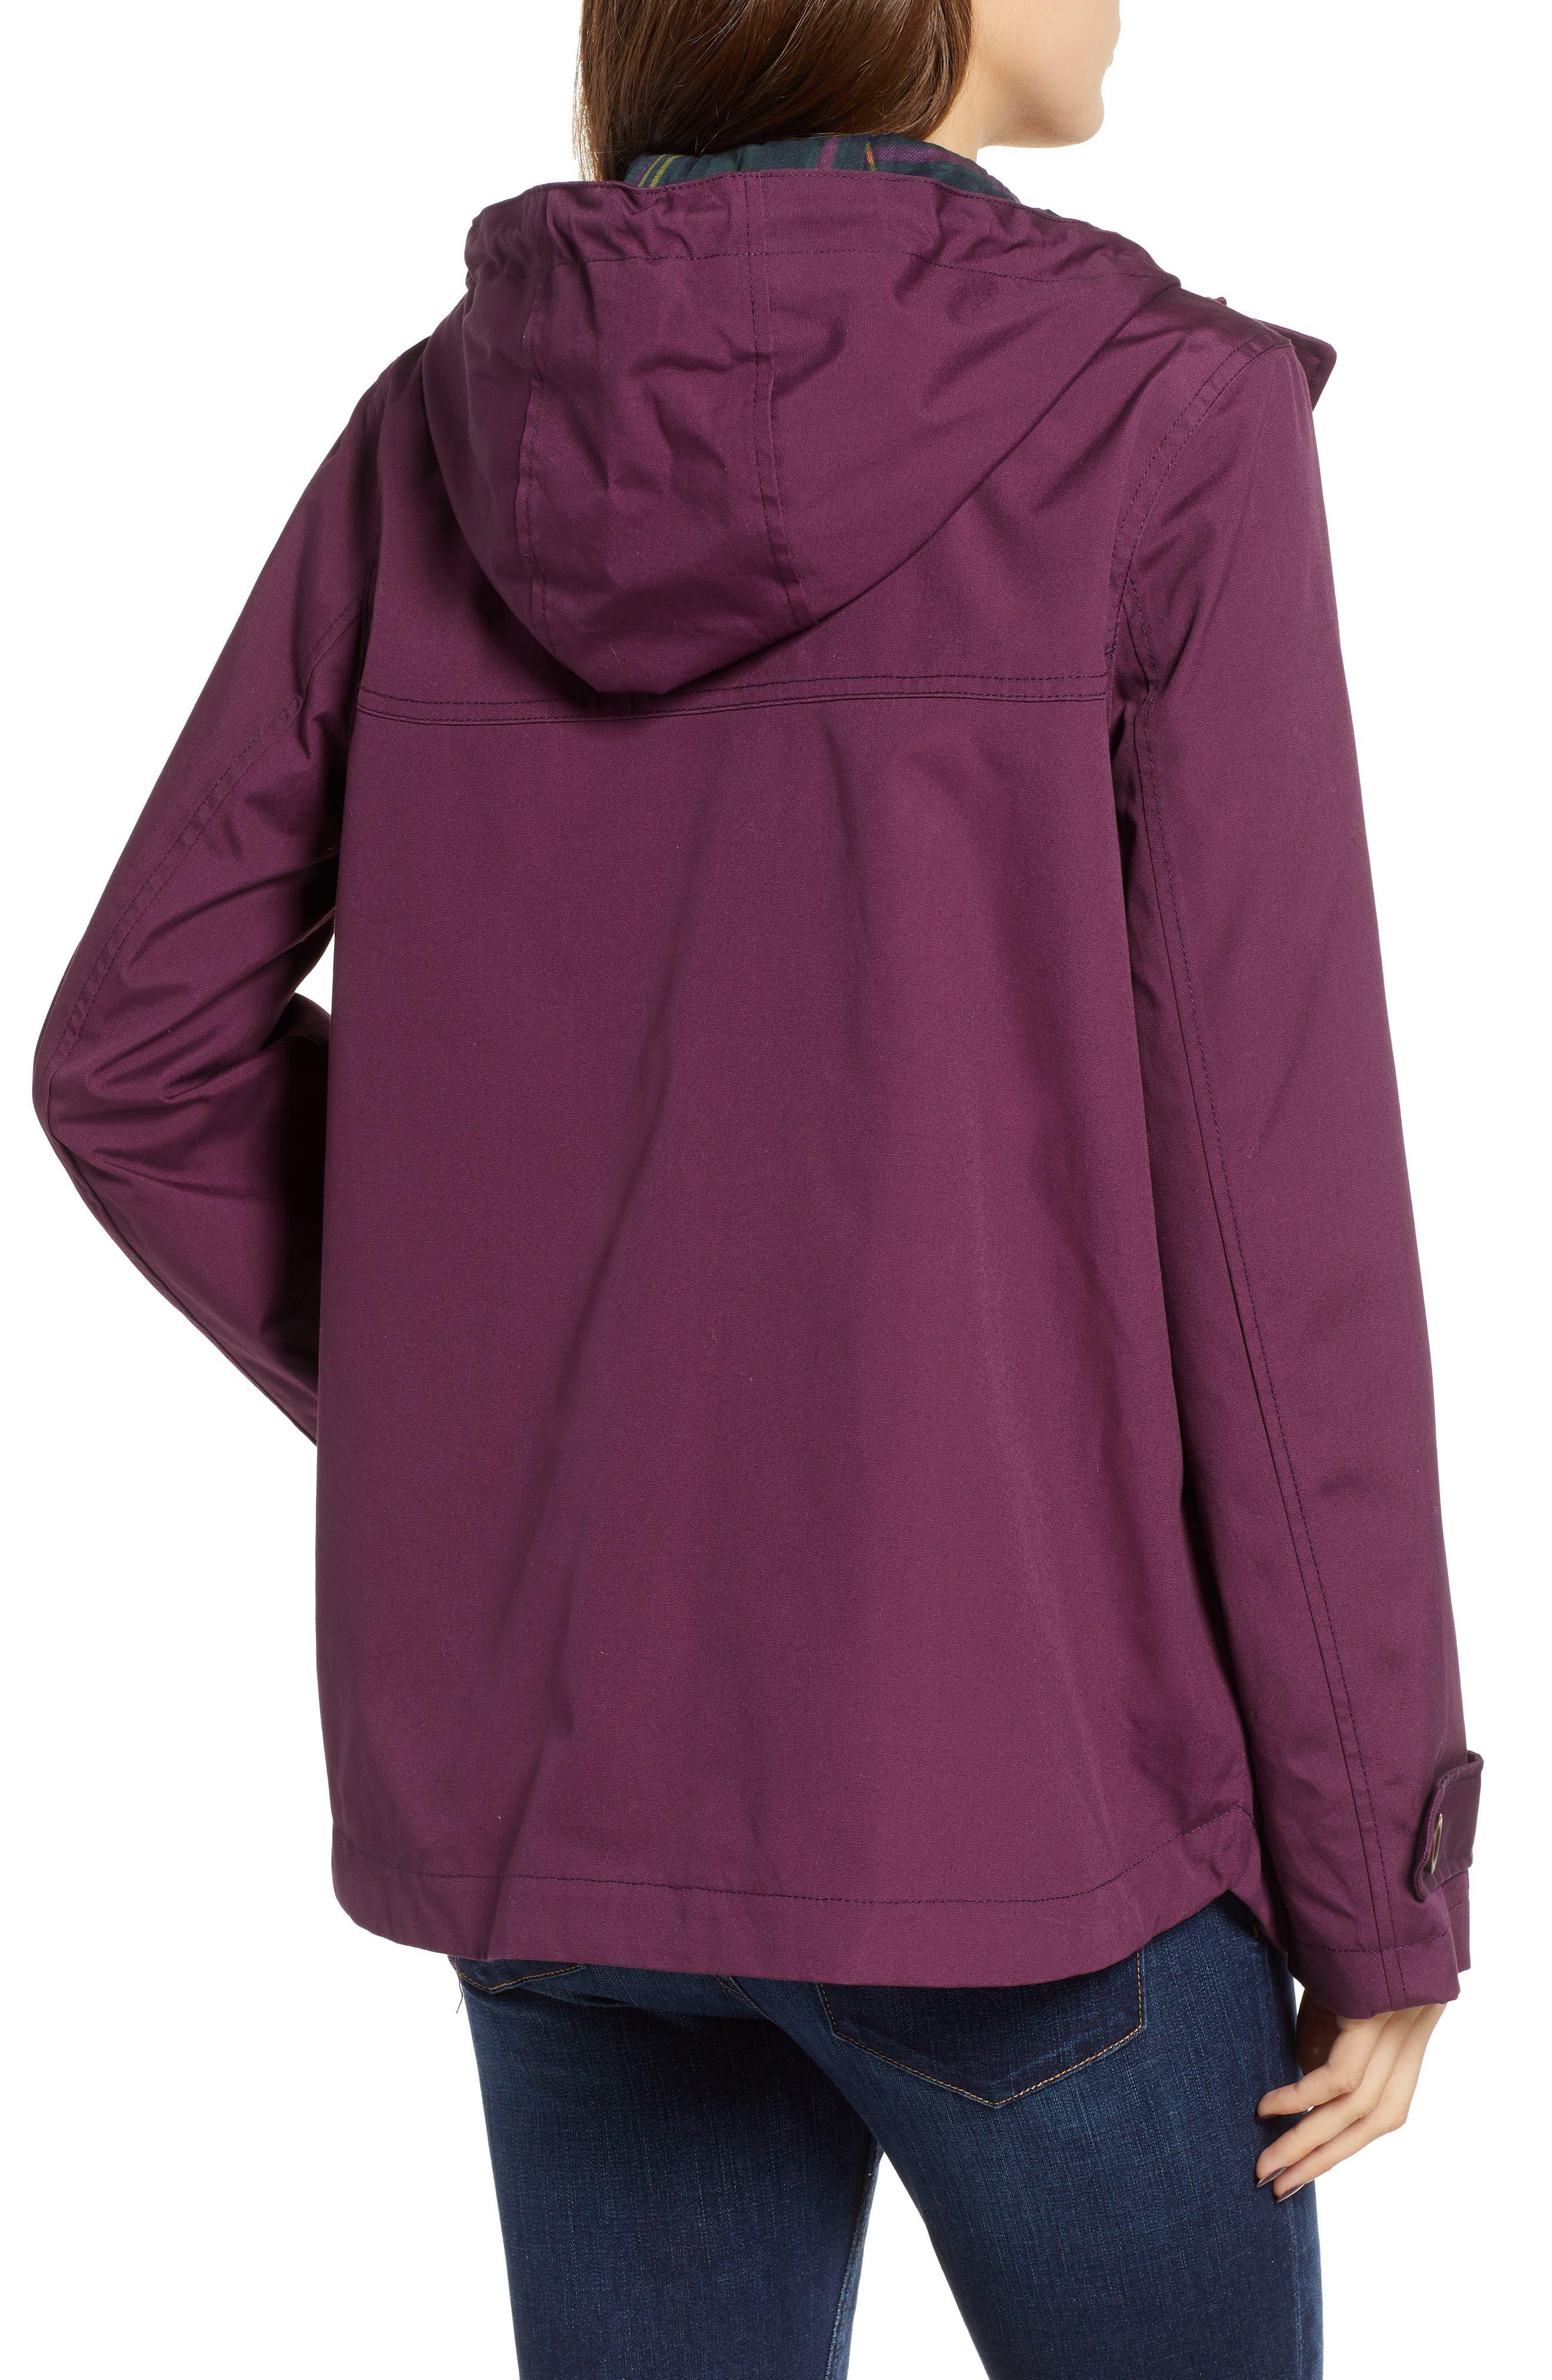 JOULES,                             Right as Rain Waterproof Hooded Jacket,                             Alternate thumbnail 2, color,                             930